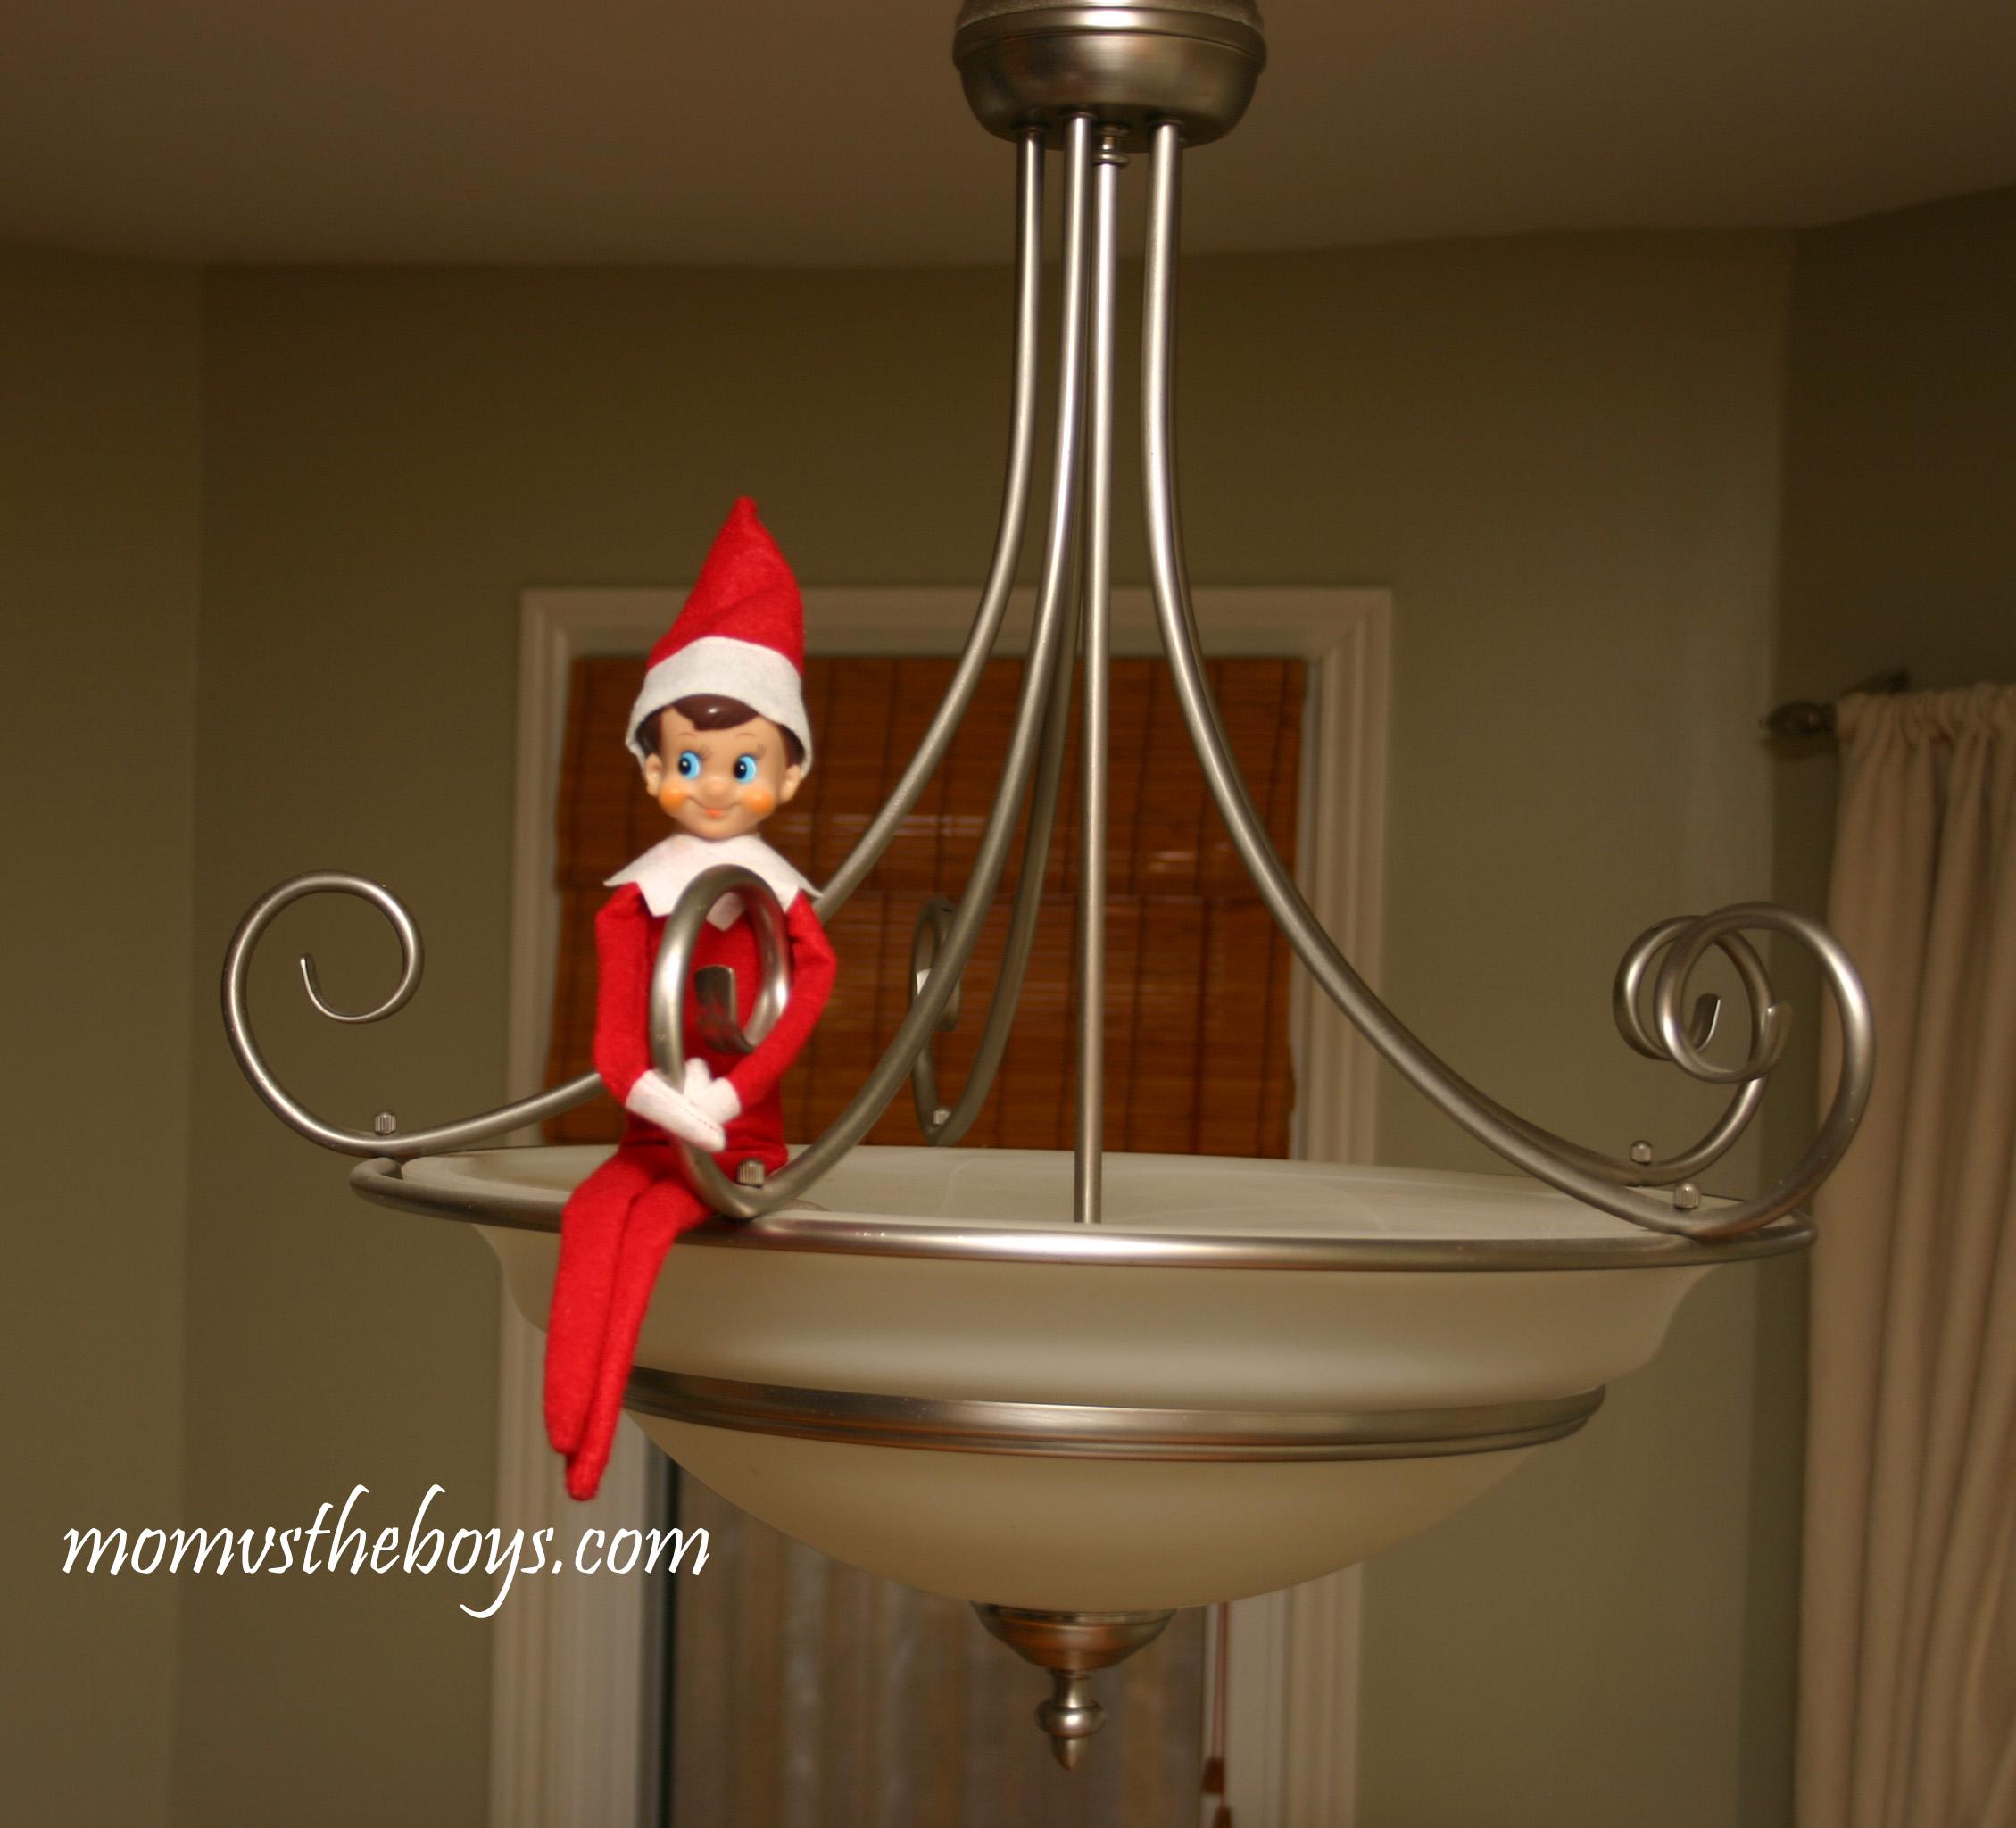 Best Hiding Spots Whiteout: Elf On The Shelf Hiding Spots